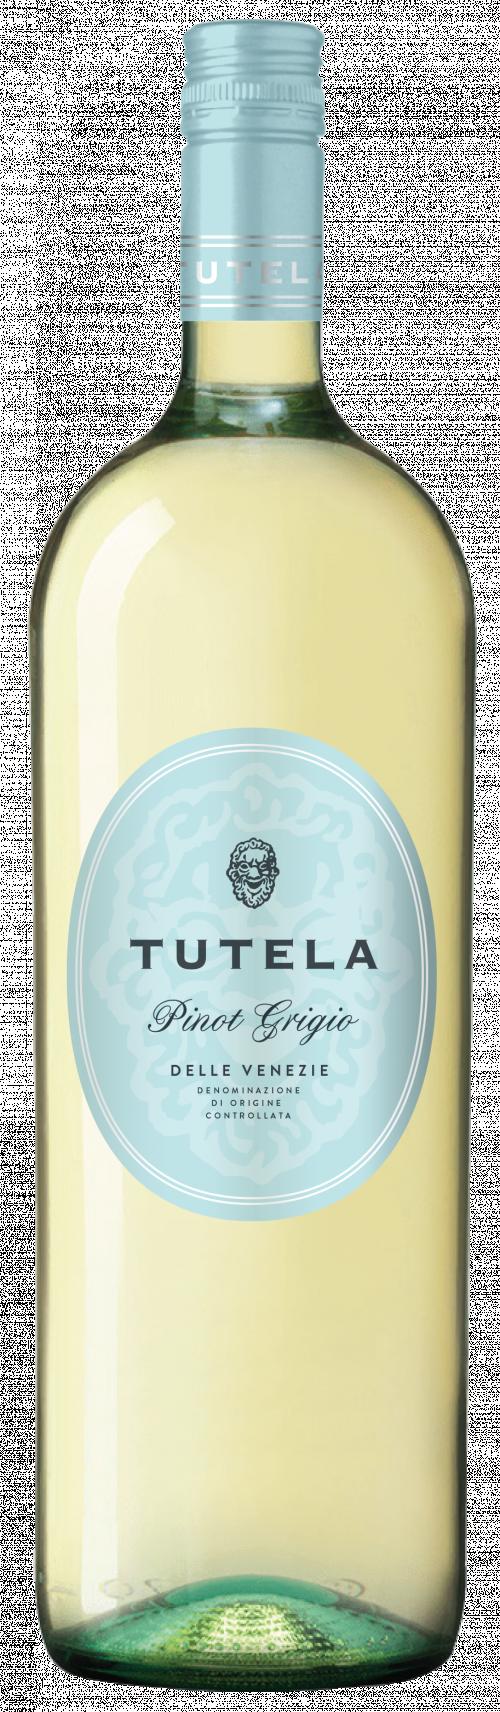 Tutela Pinot Grigio 1.5Ltr